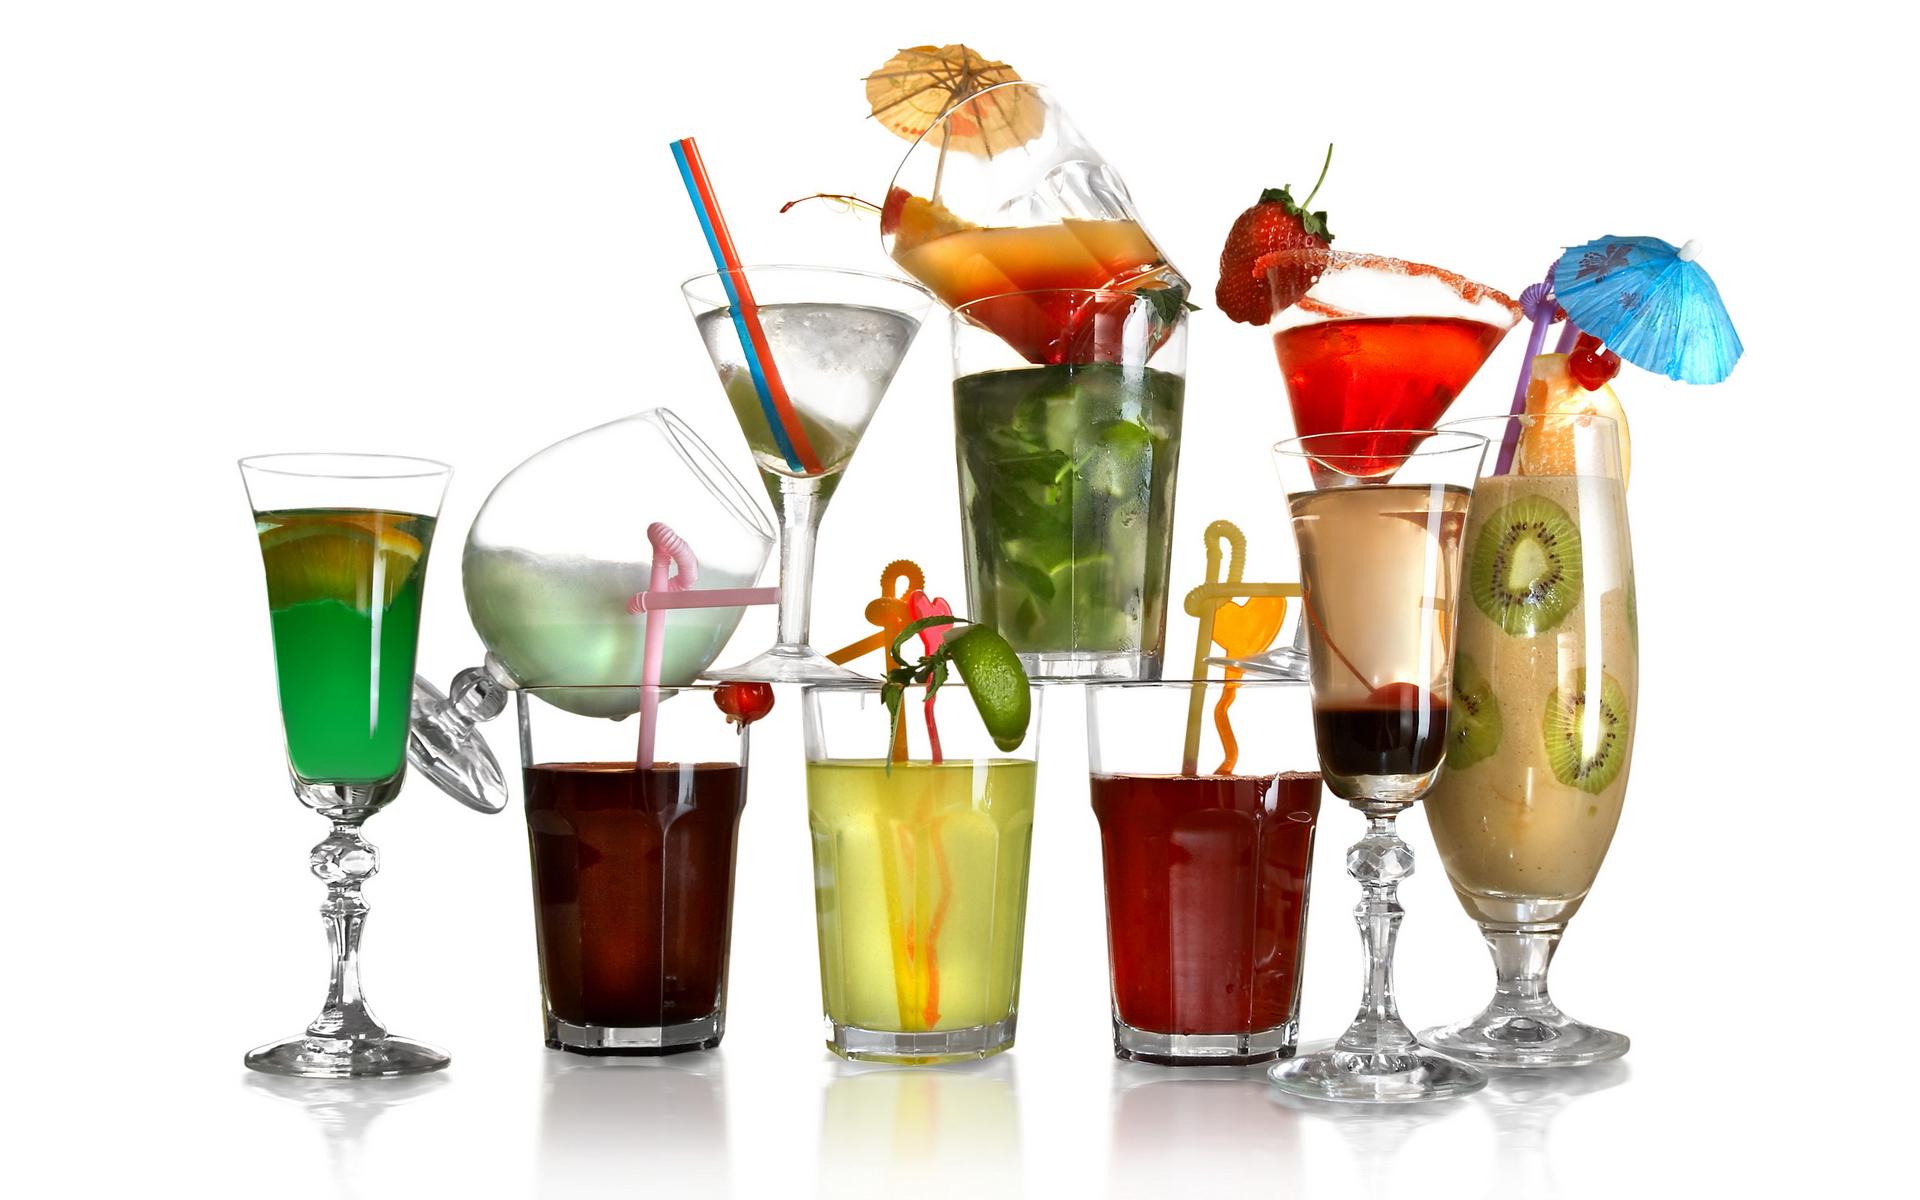 Напитки картинки для меню